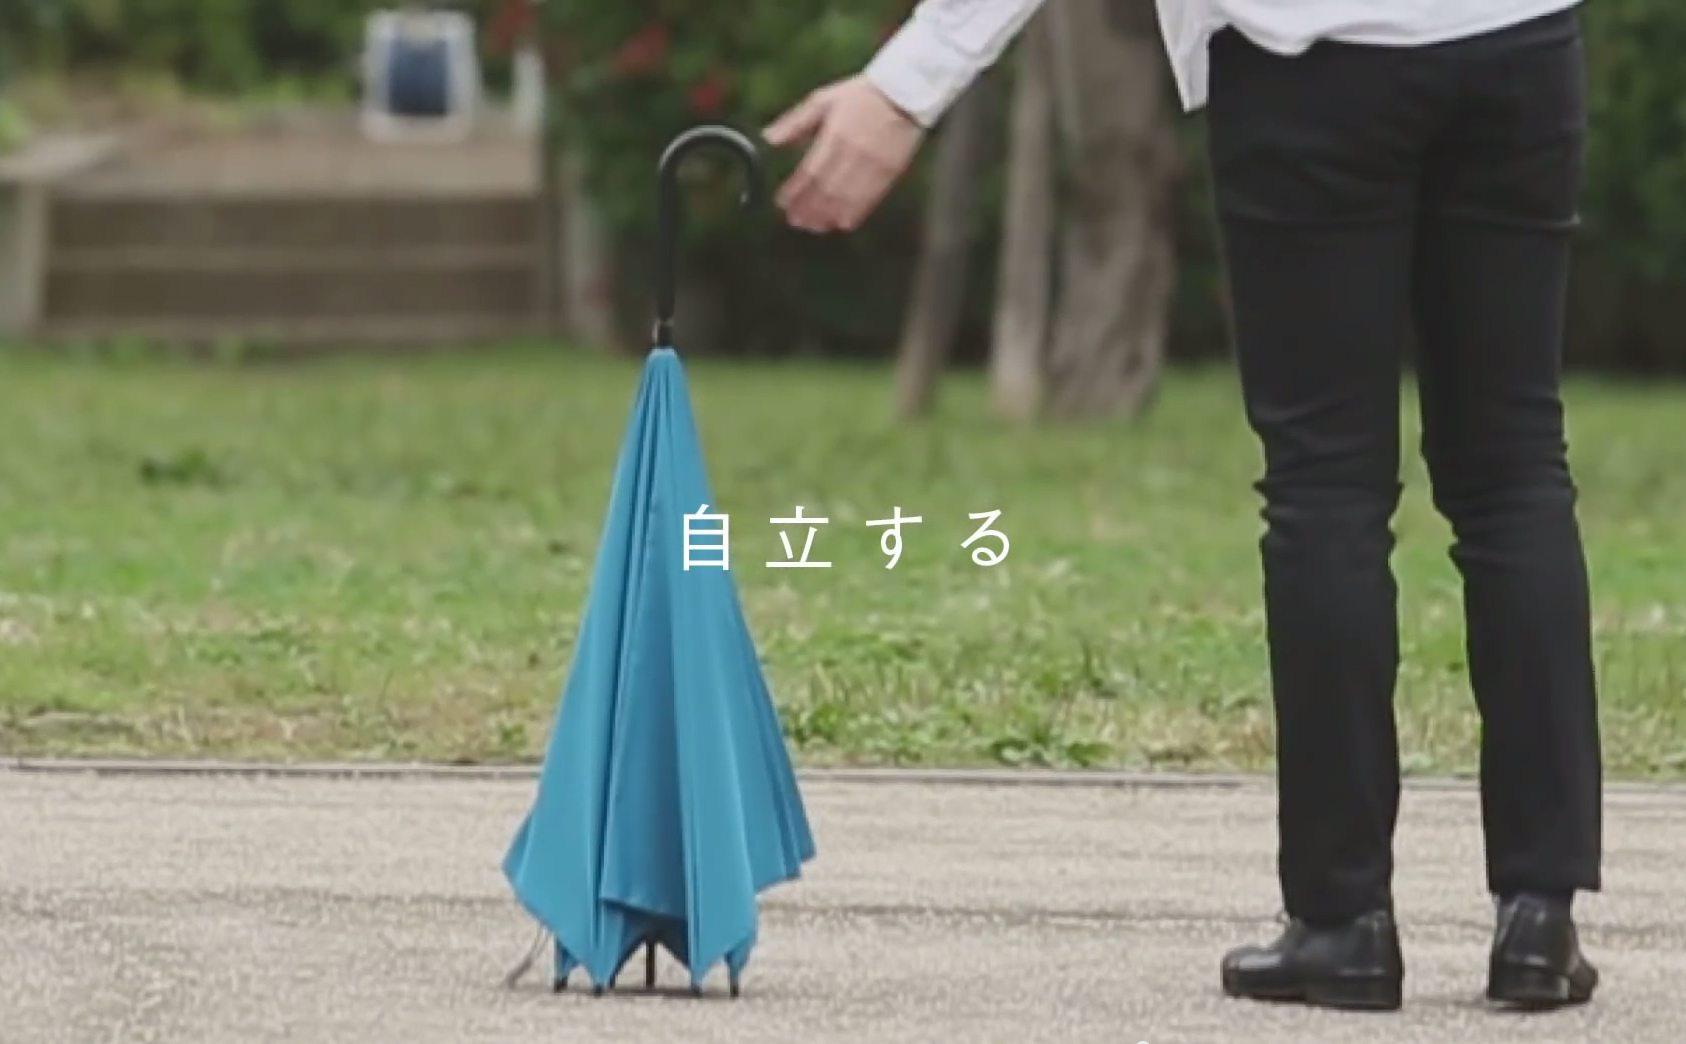 Unbrella Le Parapluie Invers 233 Par Hiroshi Kajimoto Dozodomo